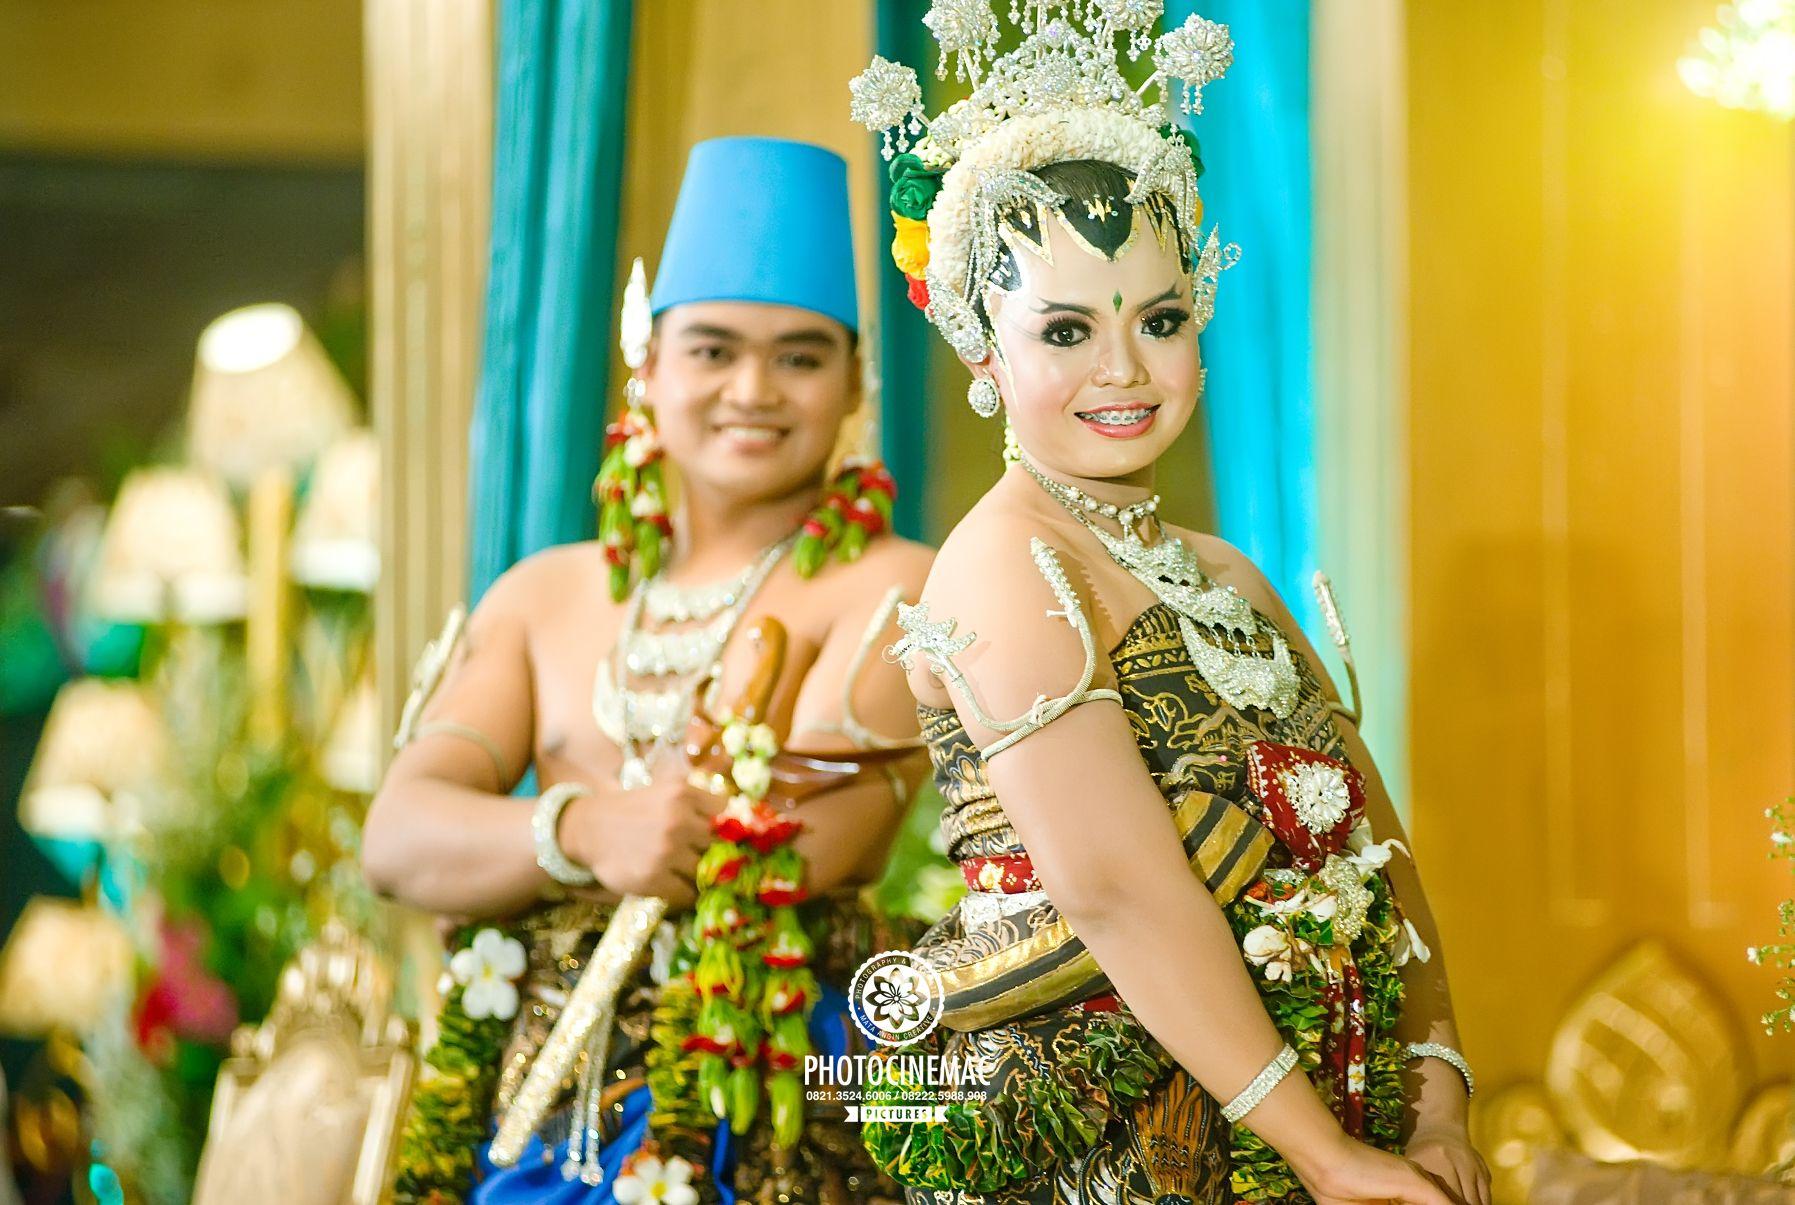 Foto Pengantin Jawa, Foto Pernikahan Baju Adat Jawa, Foto